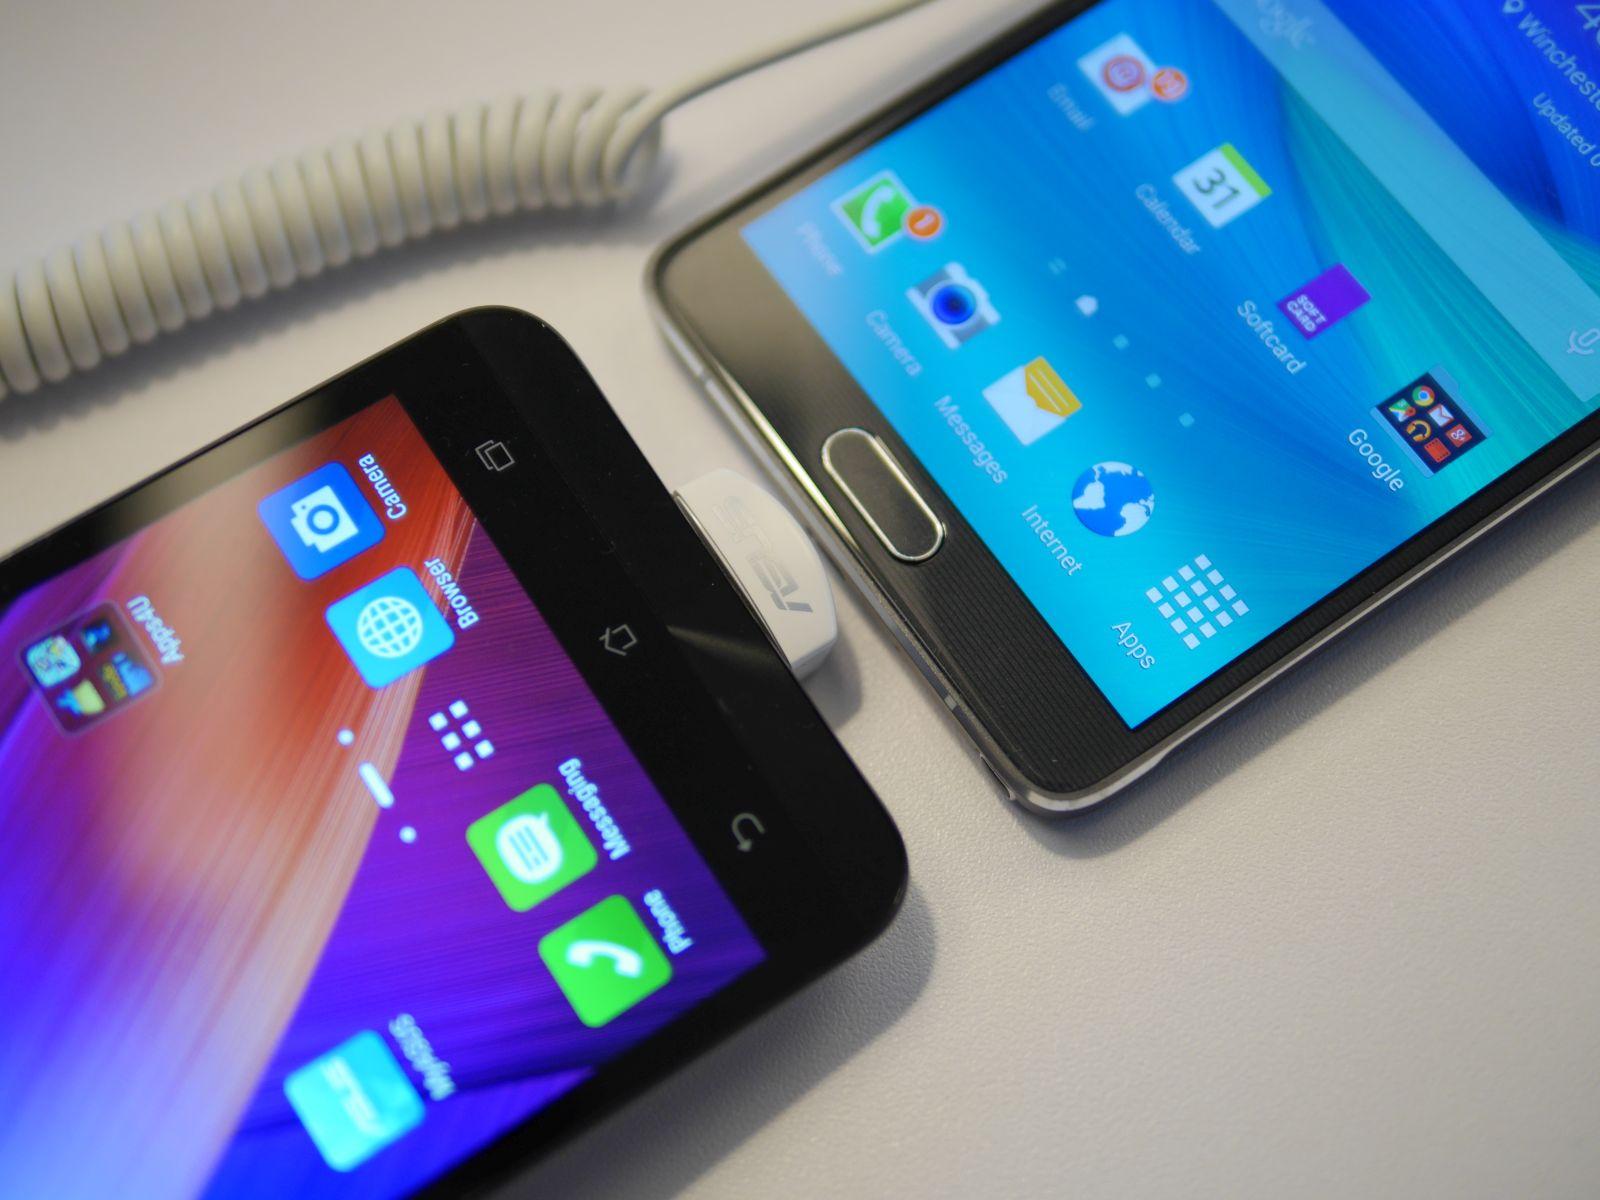 Zenfone 2 vs Note 4 - 3